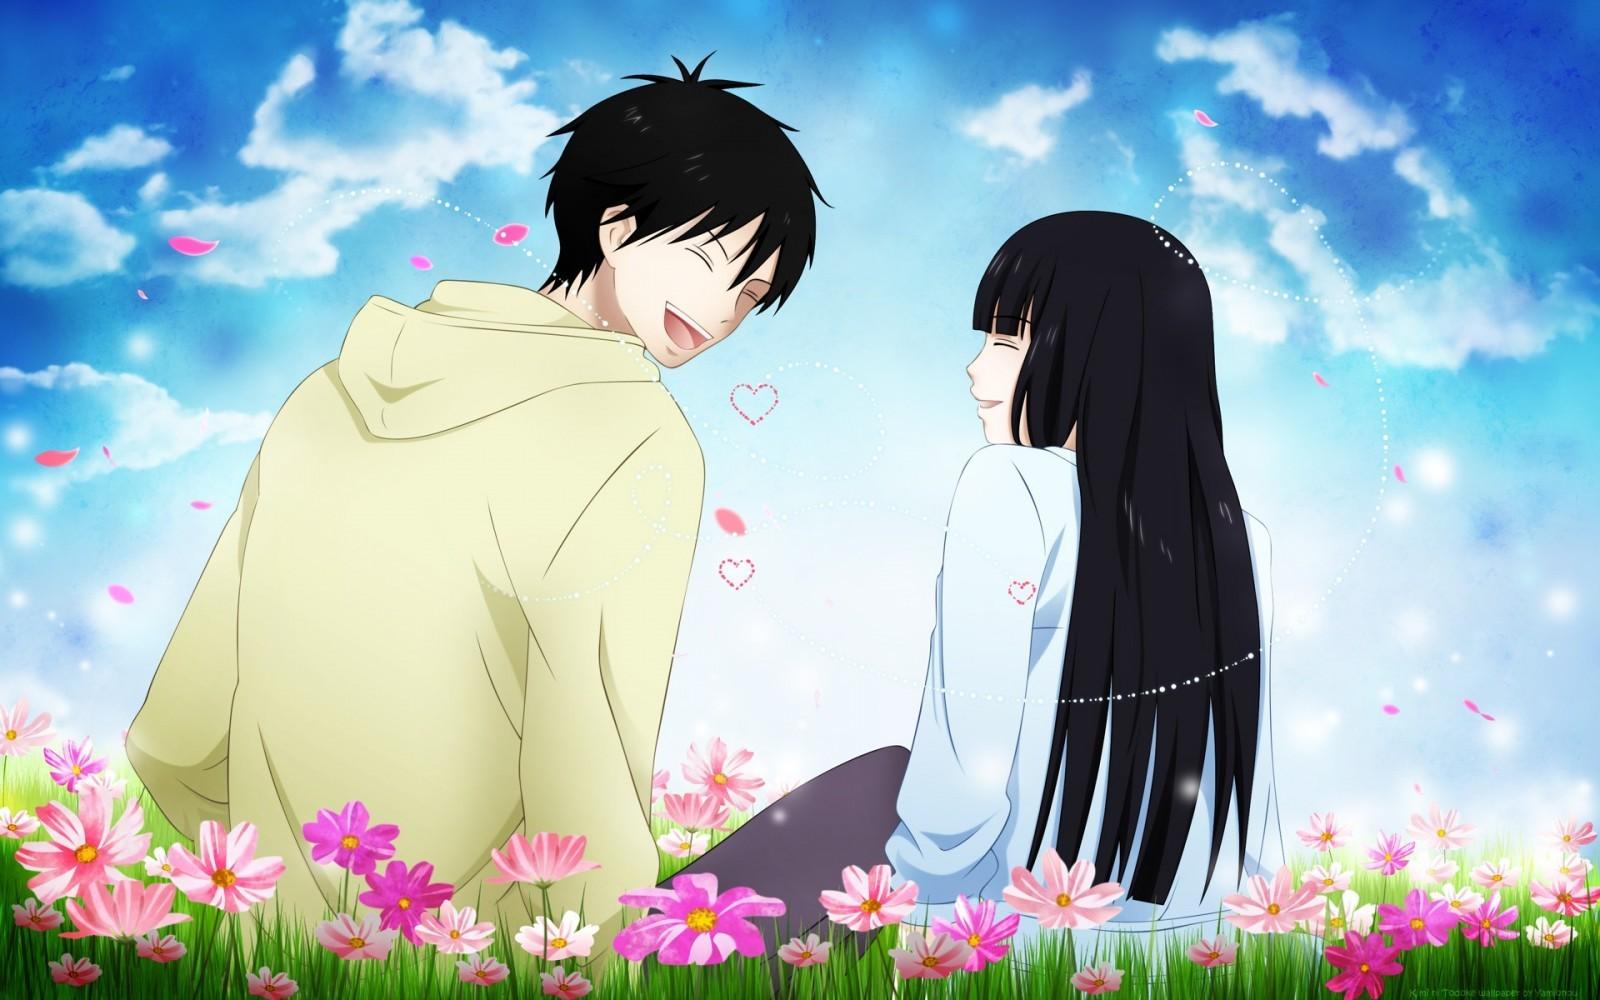 Kimi_ni_Todoke_Kazehaya_Shouta_Kuronuma_Sawako_flowers_anime_anime_boys_anime_girls_love